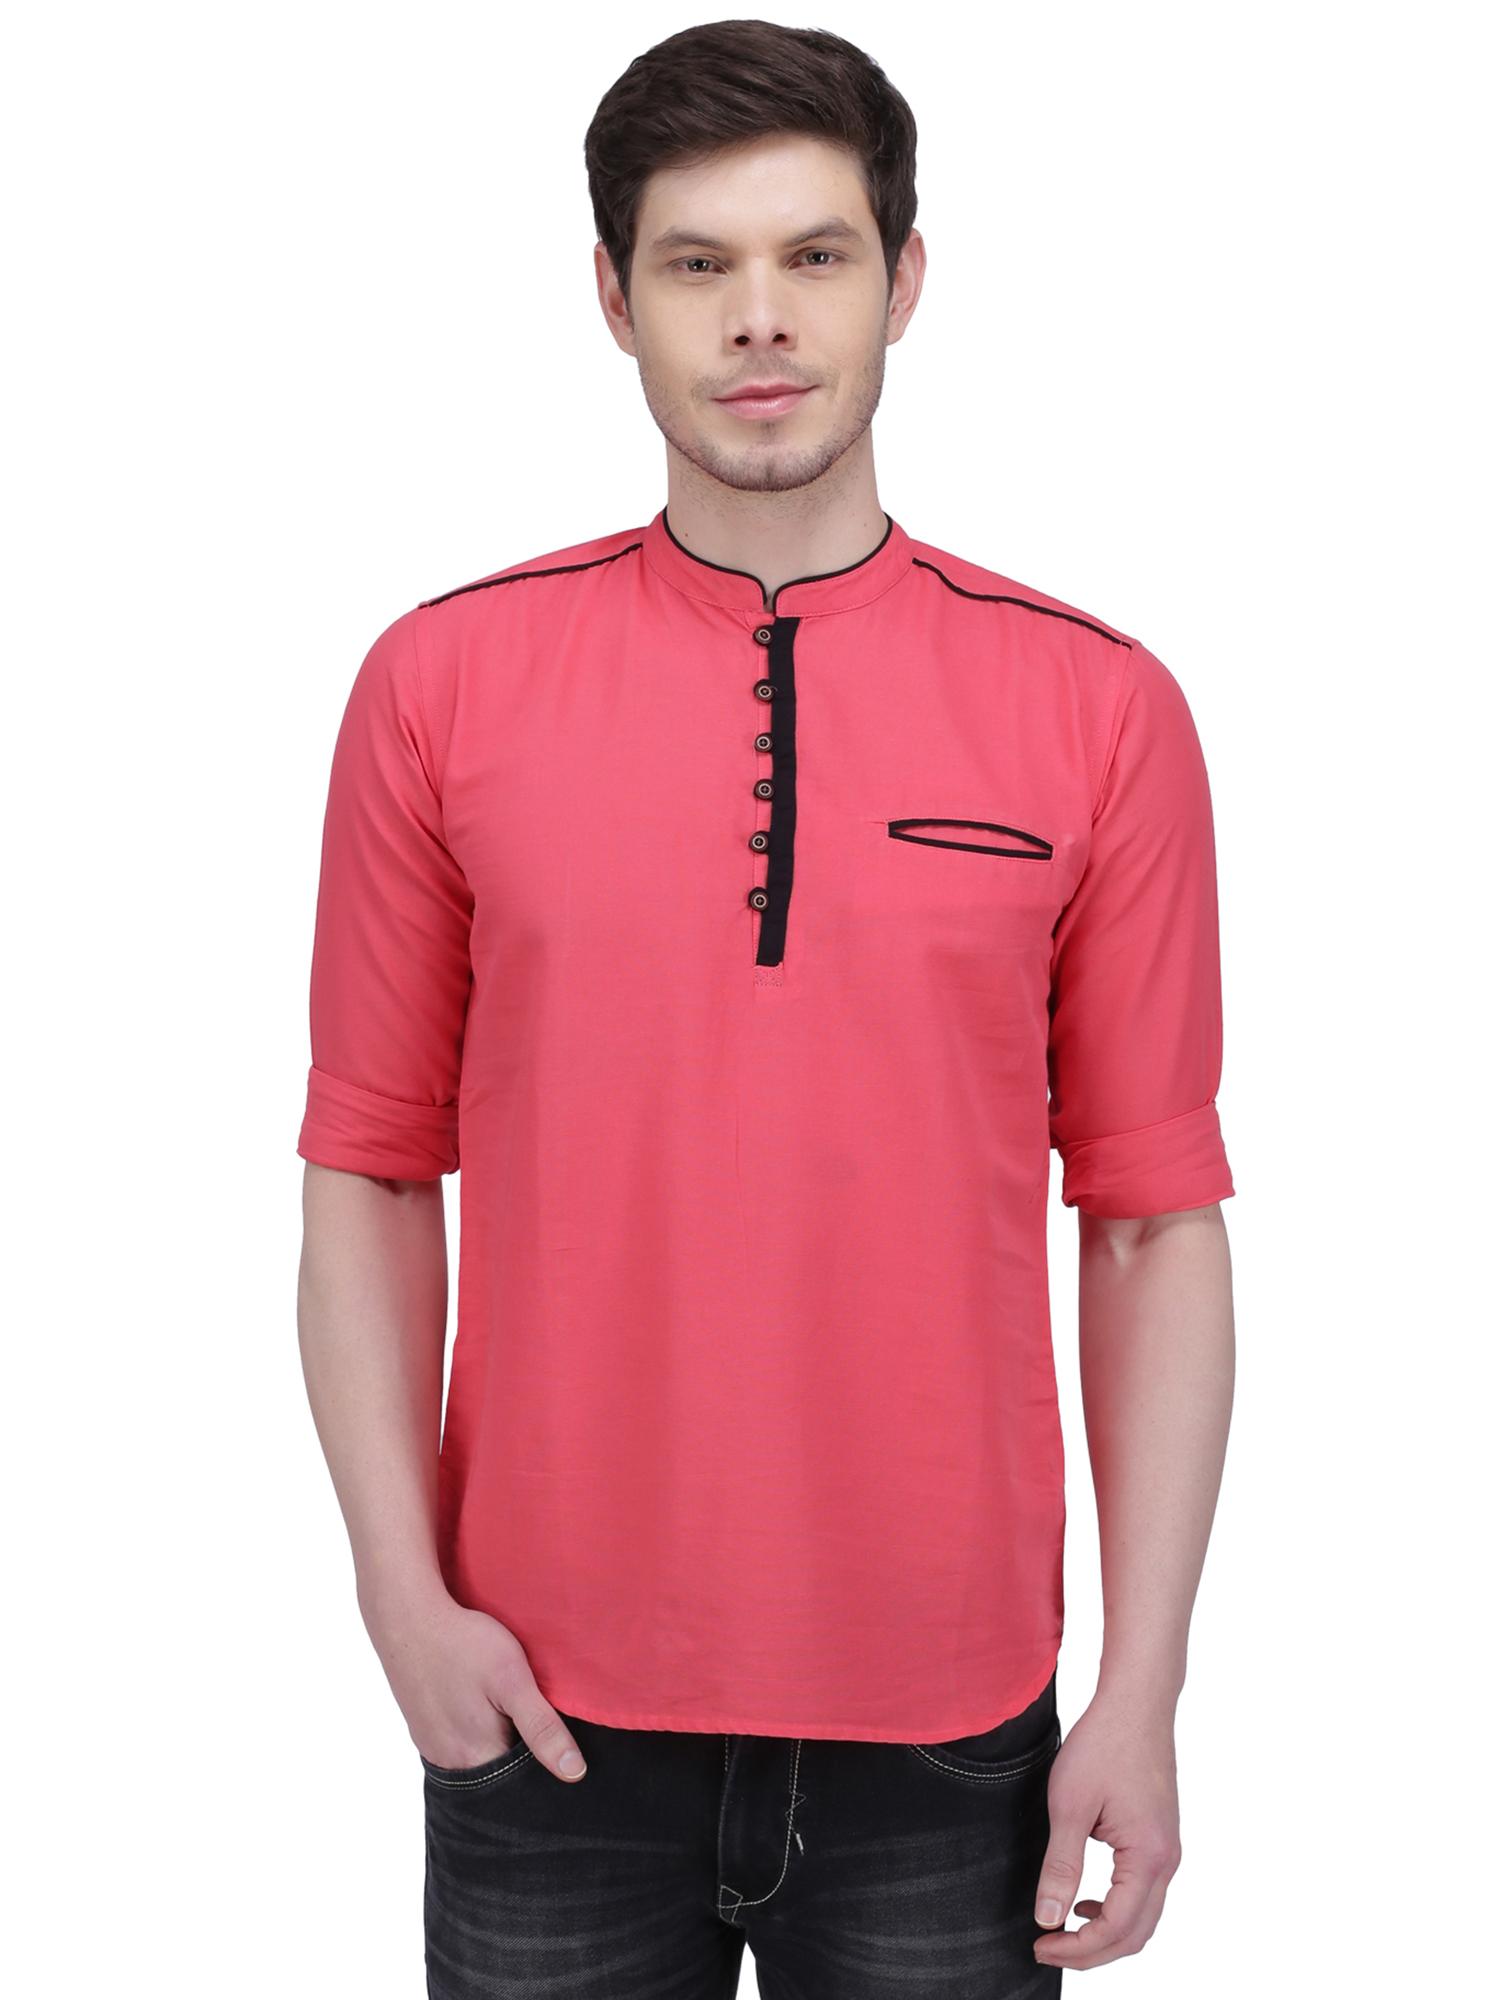 Kuons Avenue | Kuons Avenue Men's Salmon Pink Linen Cotton Short Kurta- KACLFS1155PK